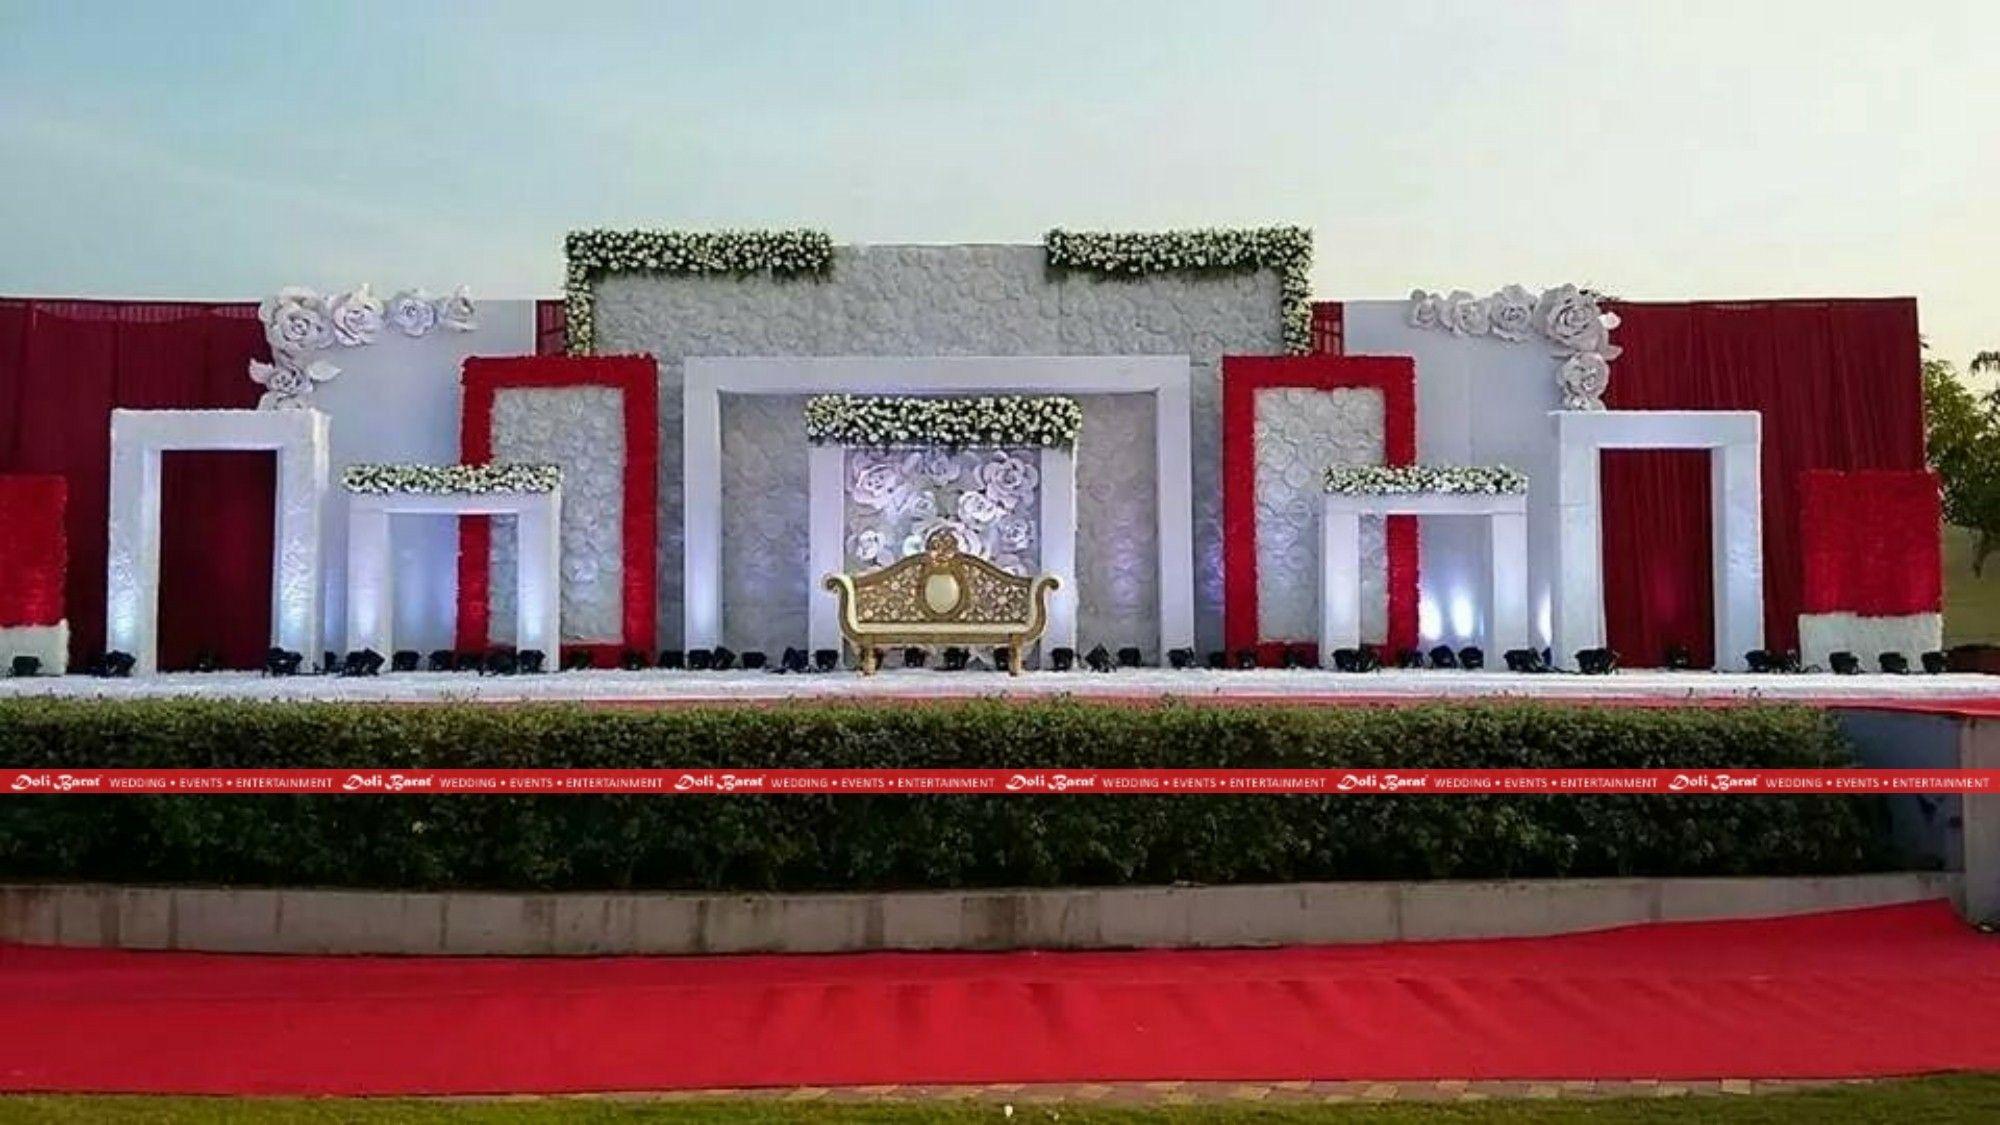 Wedding gate and stage decoration  Pin by Sriram NandiKanti on miscellaneous in   Pinterest